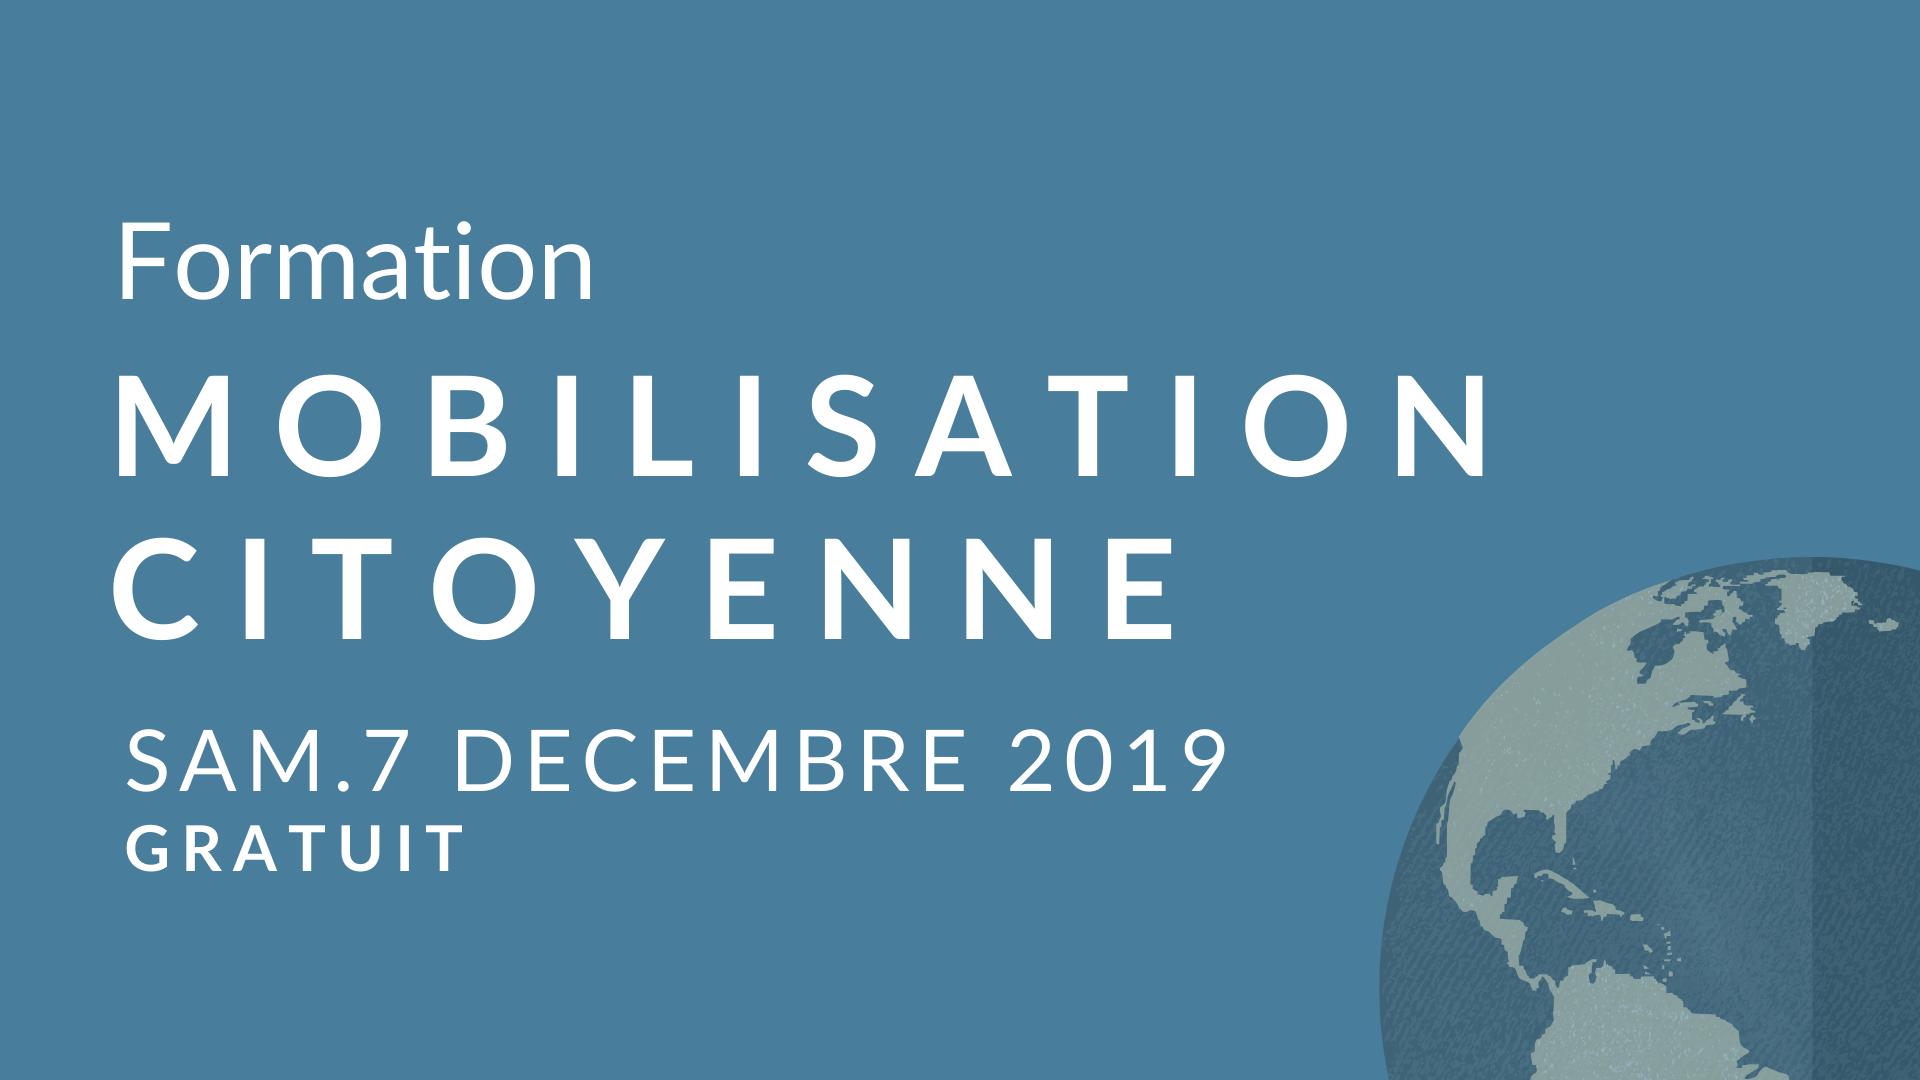 mobilisation_citoyenne-4.png